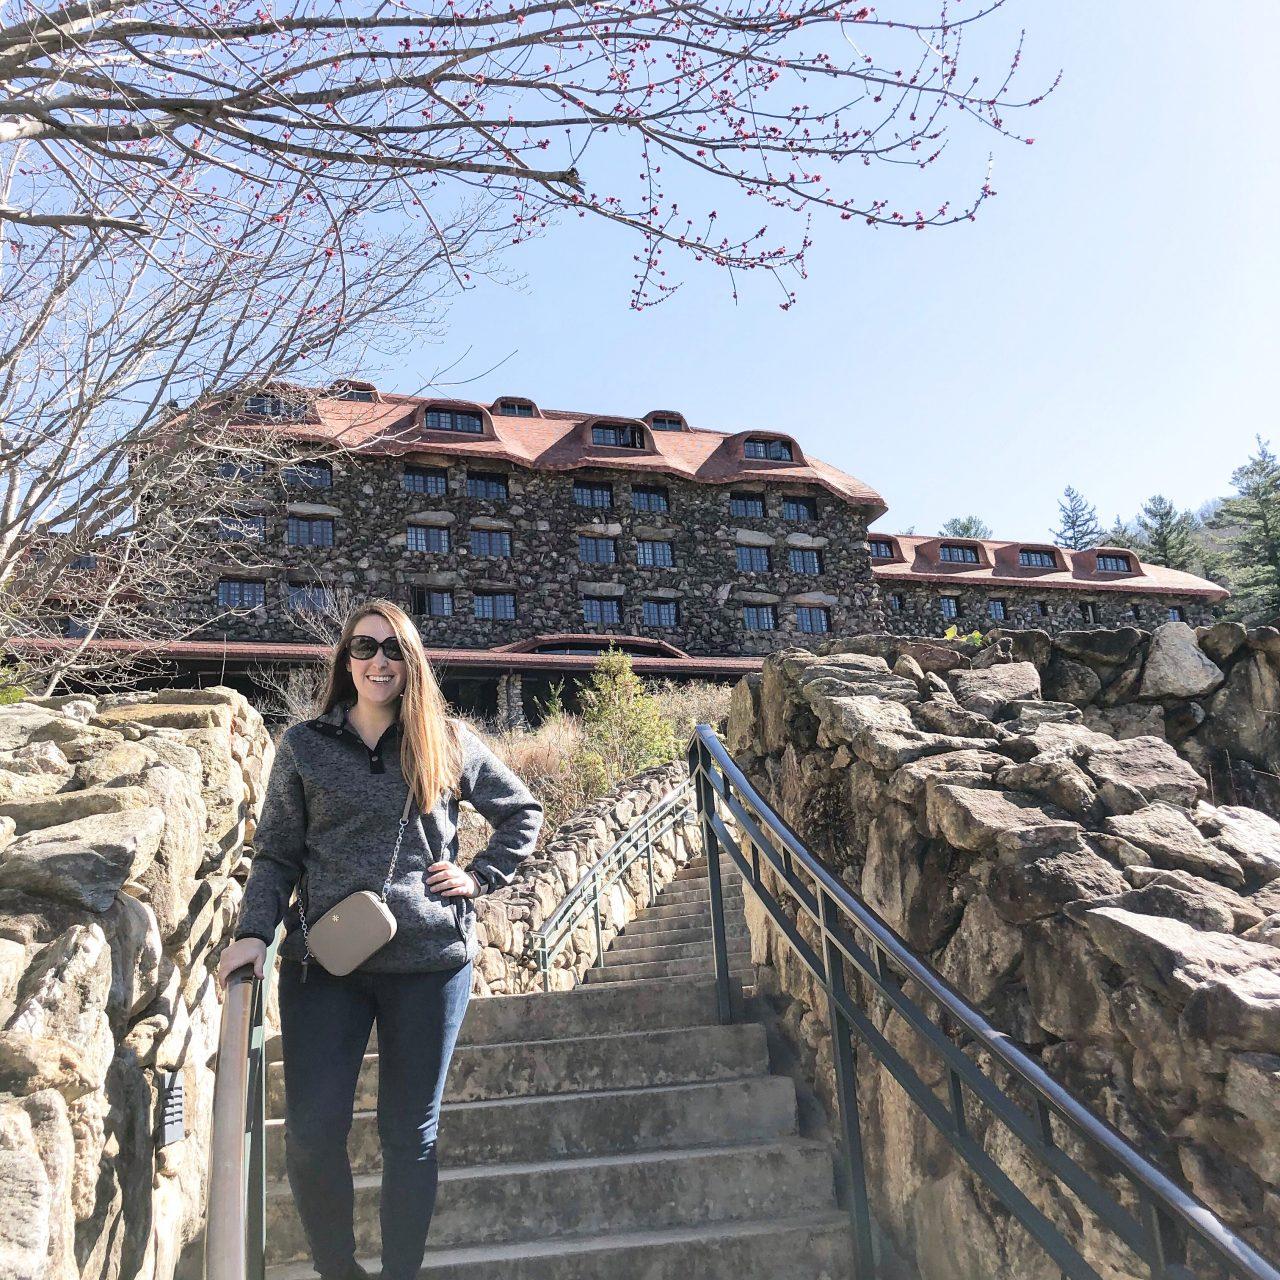 A Romantic Getaway at The Omni Grove Park Inn in Asheville, NC